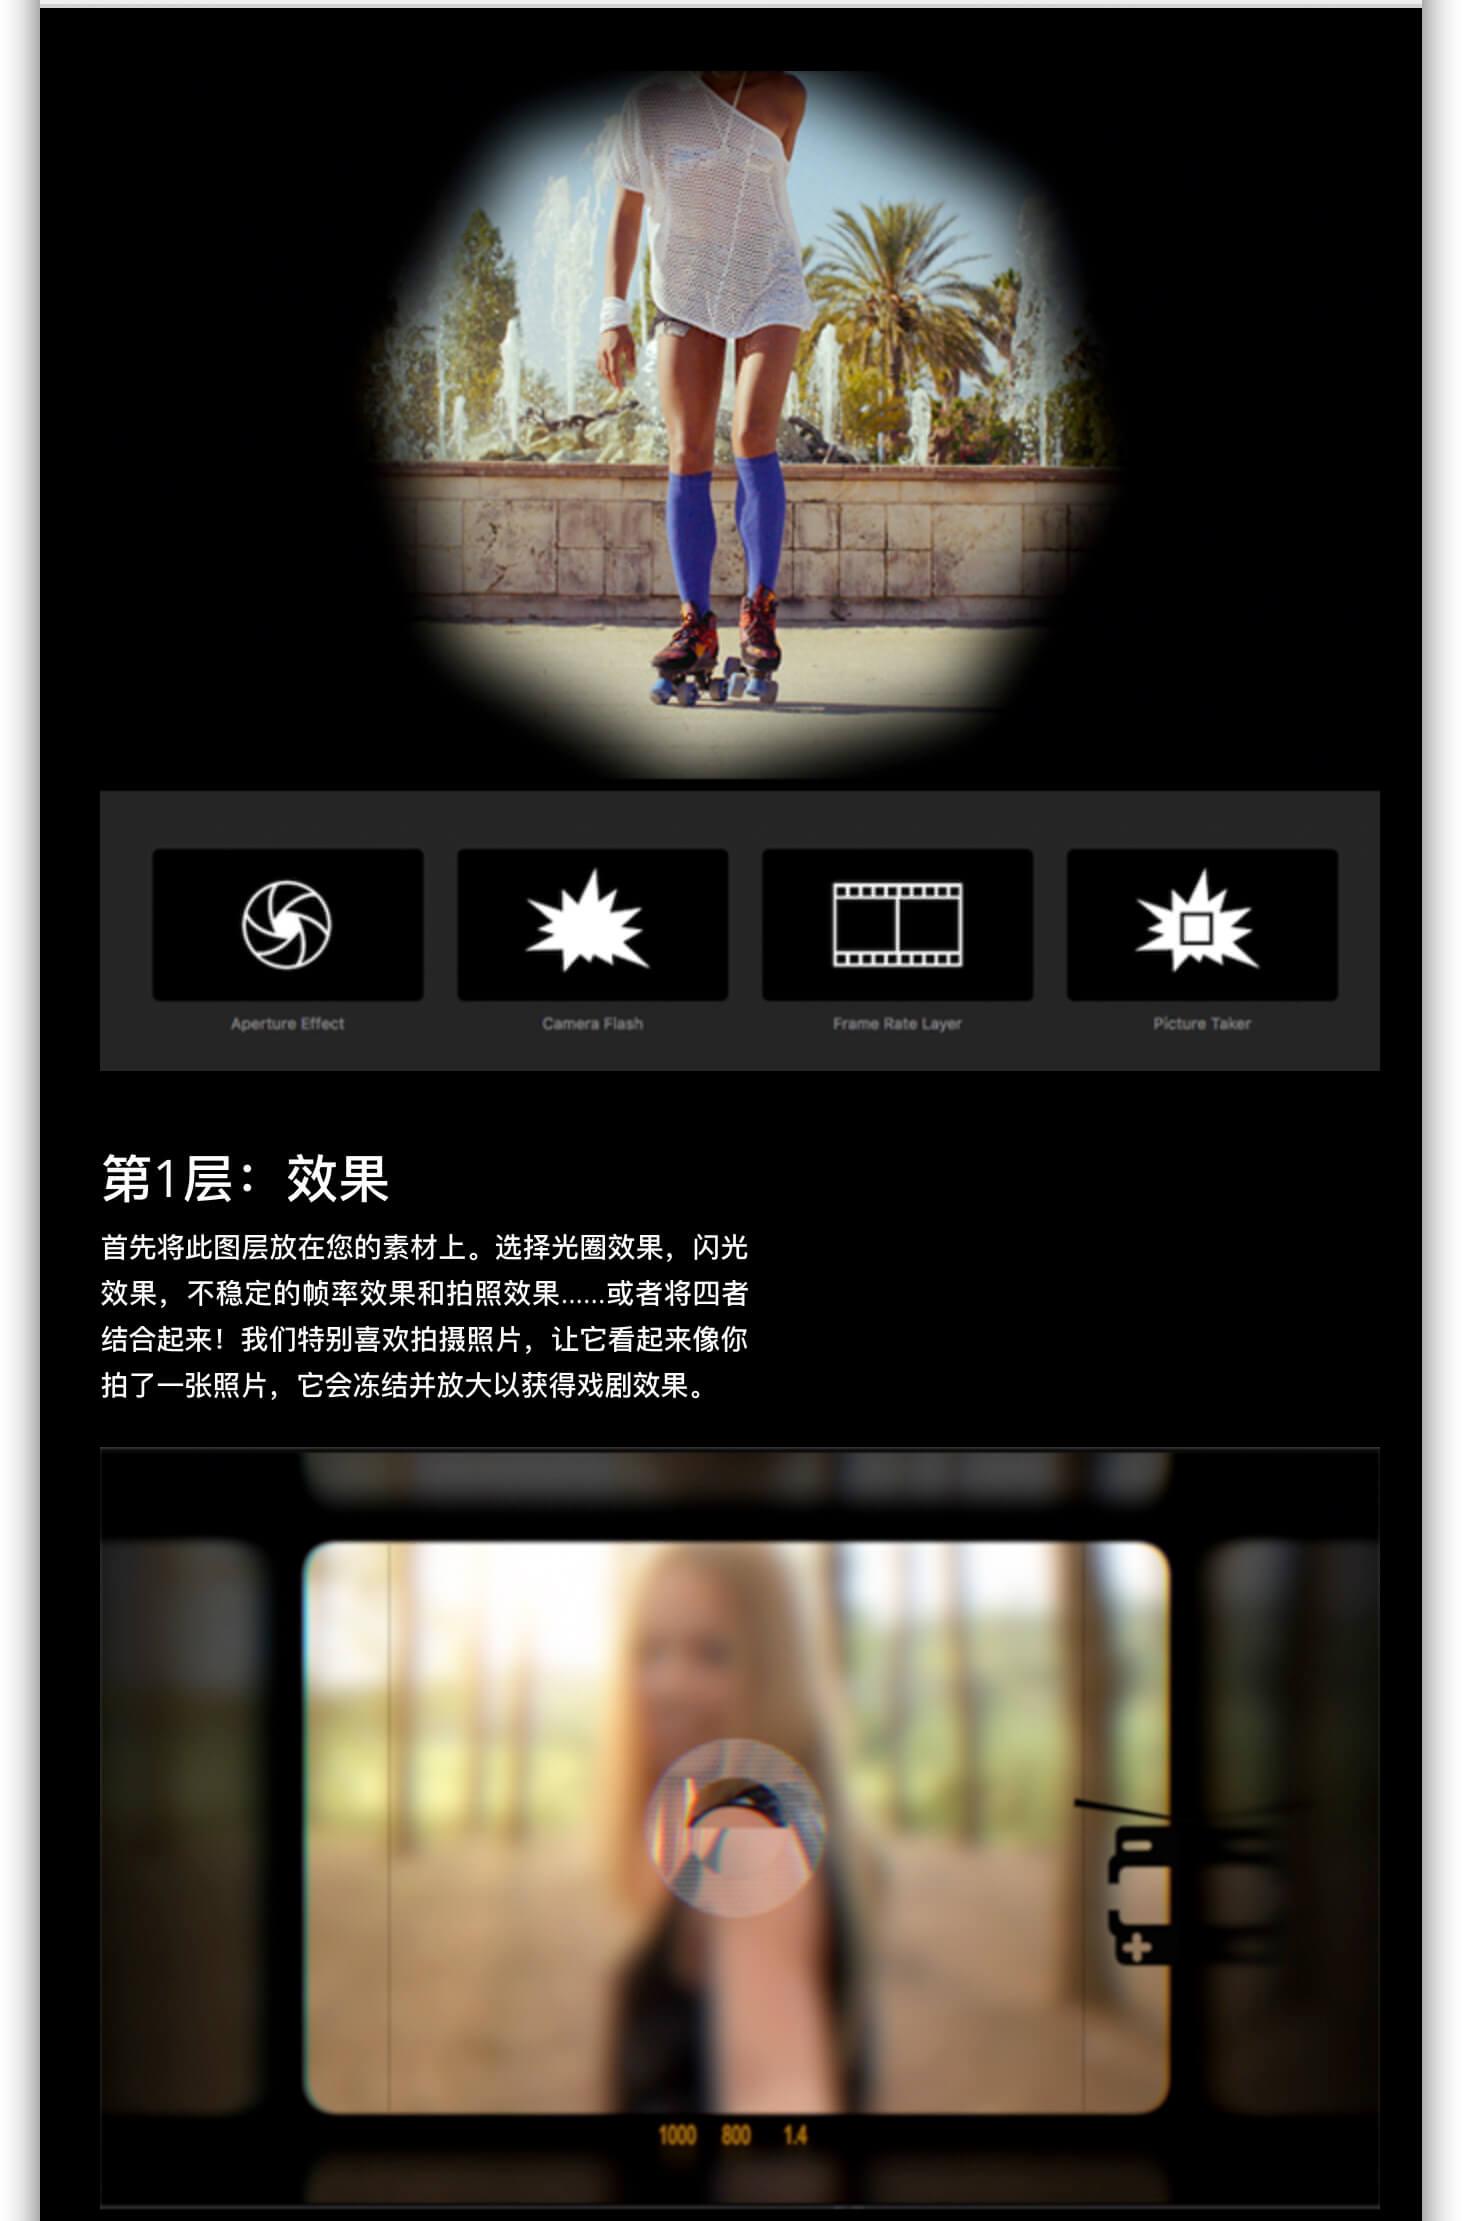 Fcpx插件 56个模拟相机取景器效果动画模板 支持M1 CineFlare Viewfinder